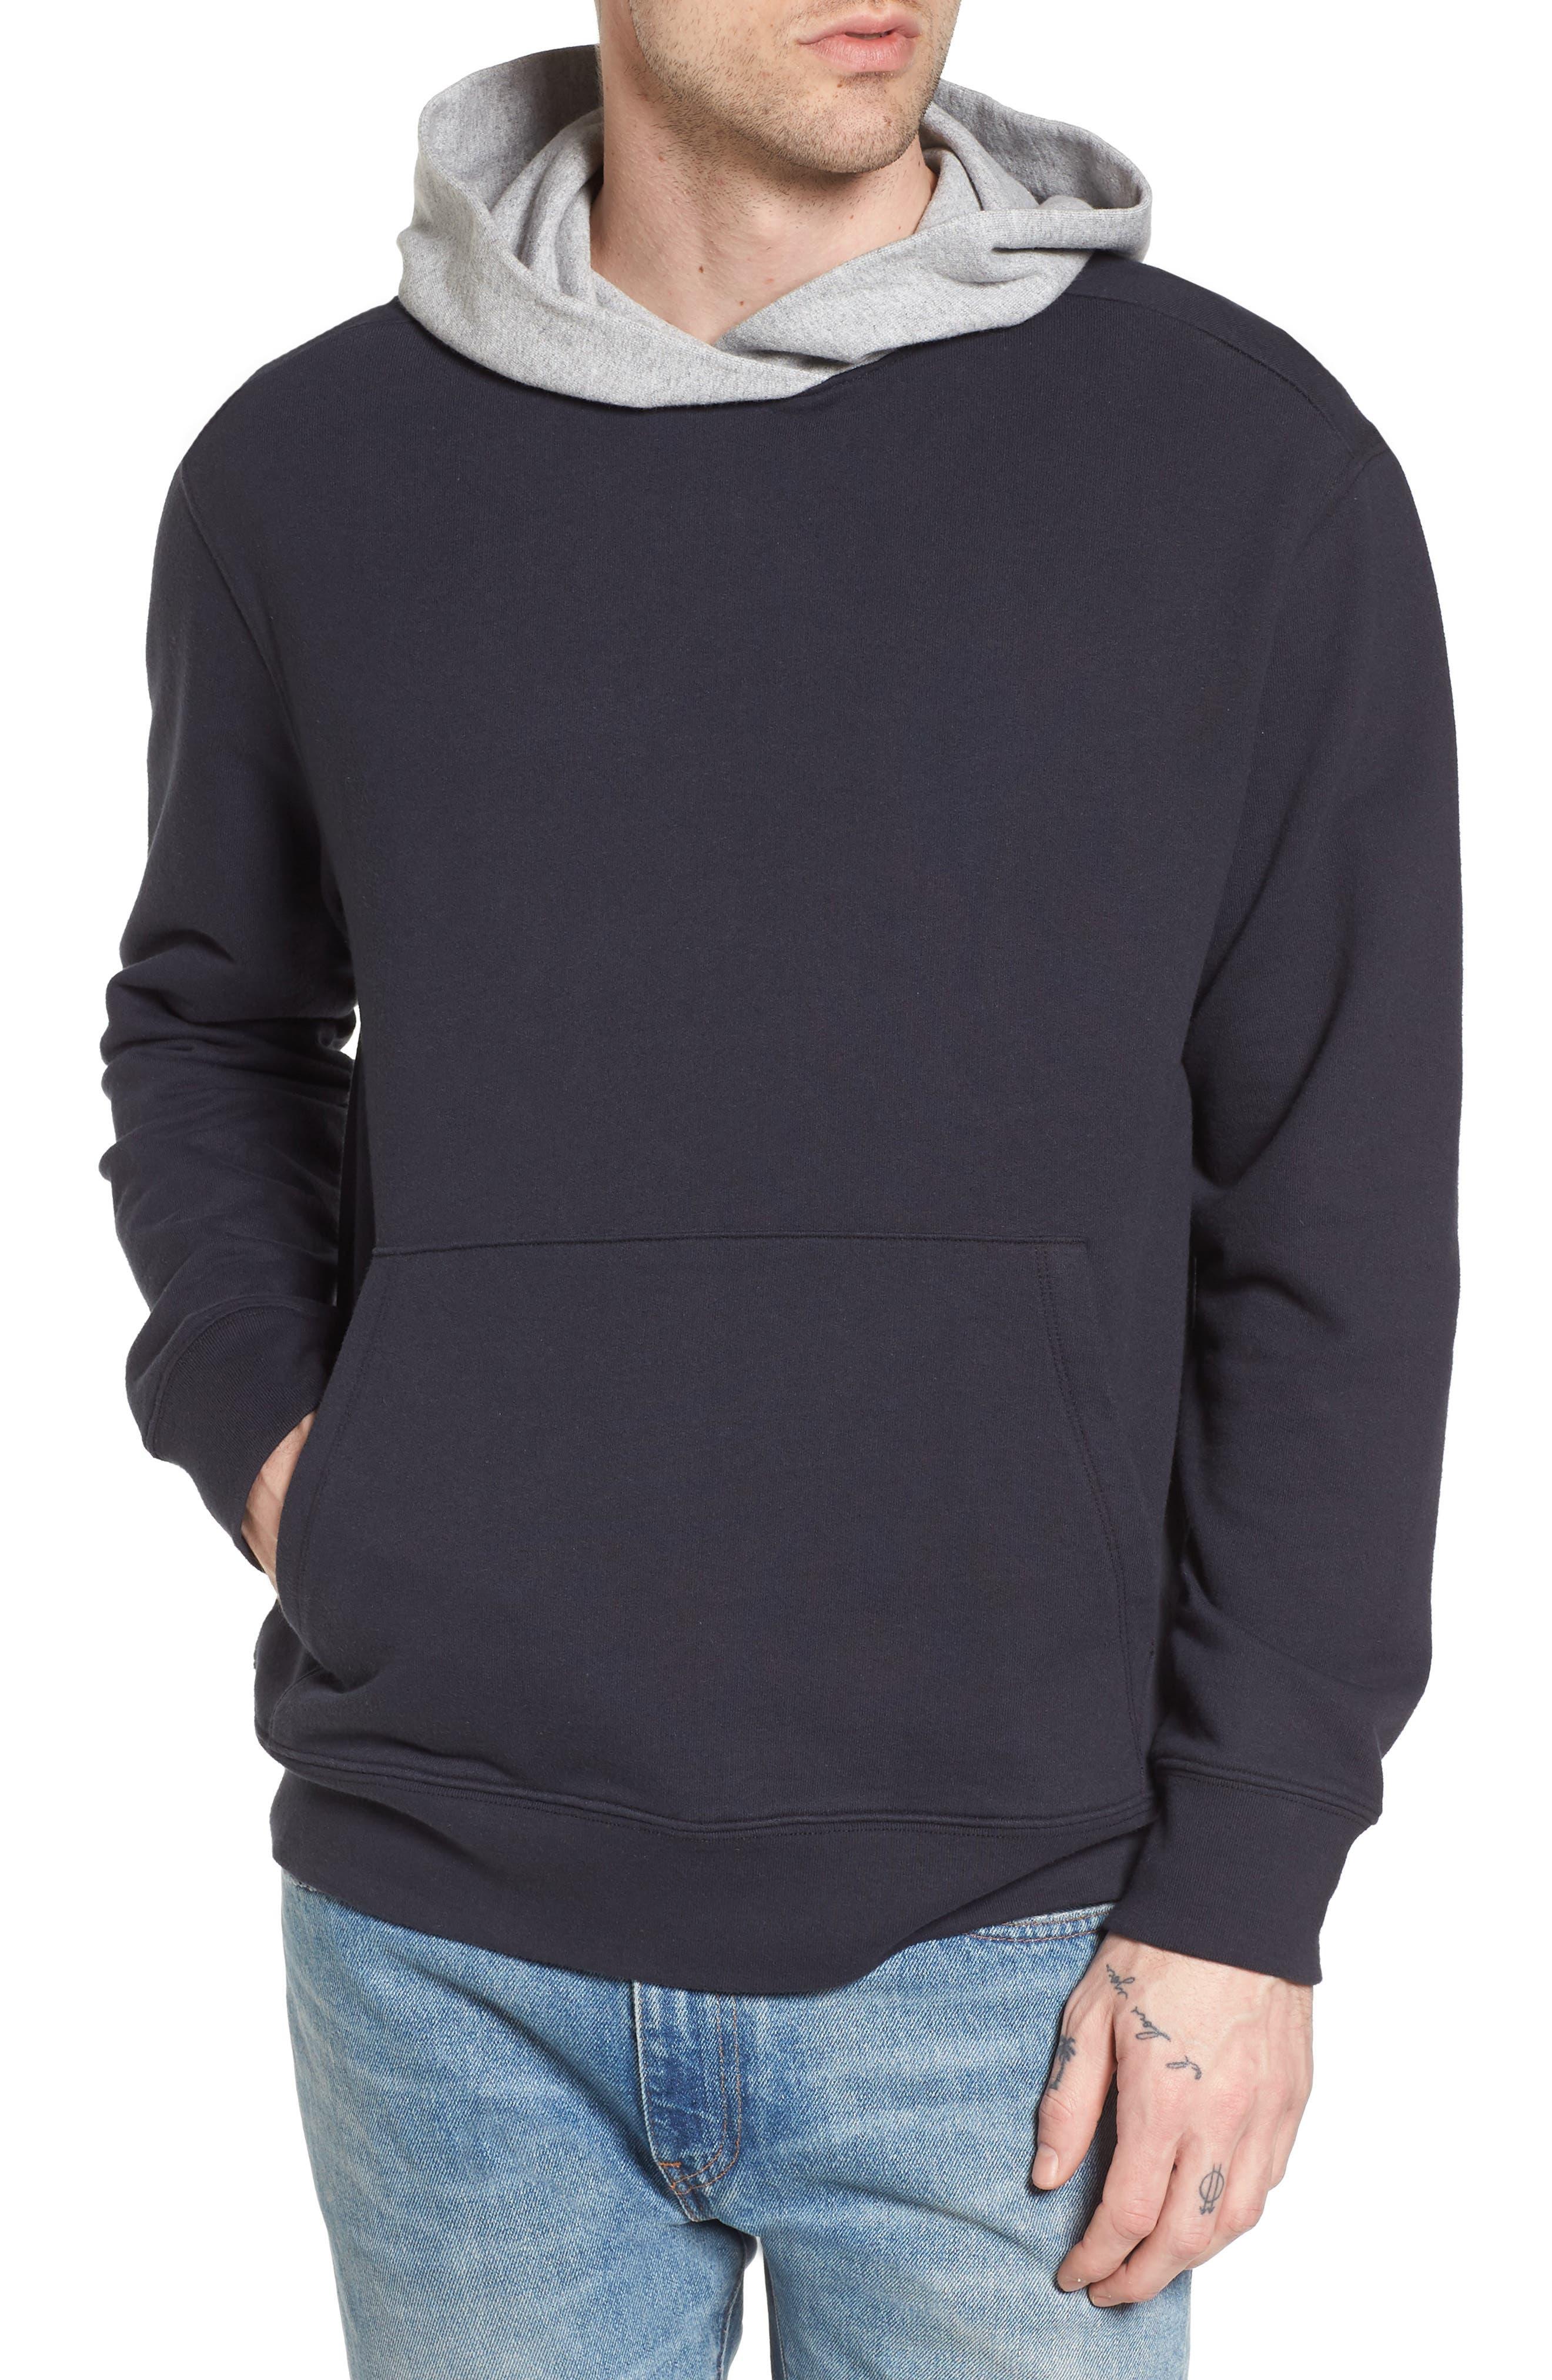 Colorblock Hoodie Sweatshirt,                             Main thumbnail 1, color,                             001